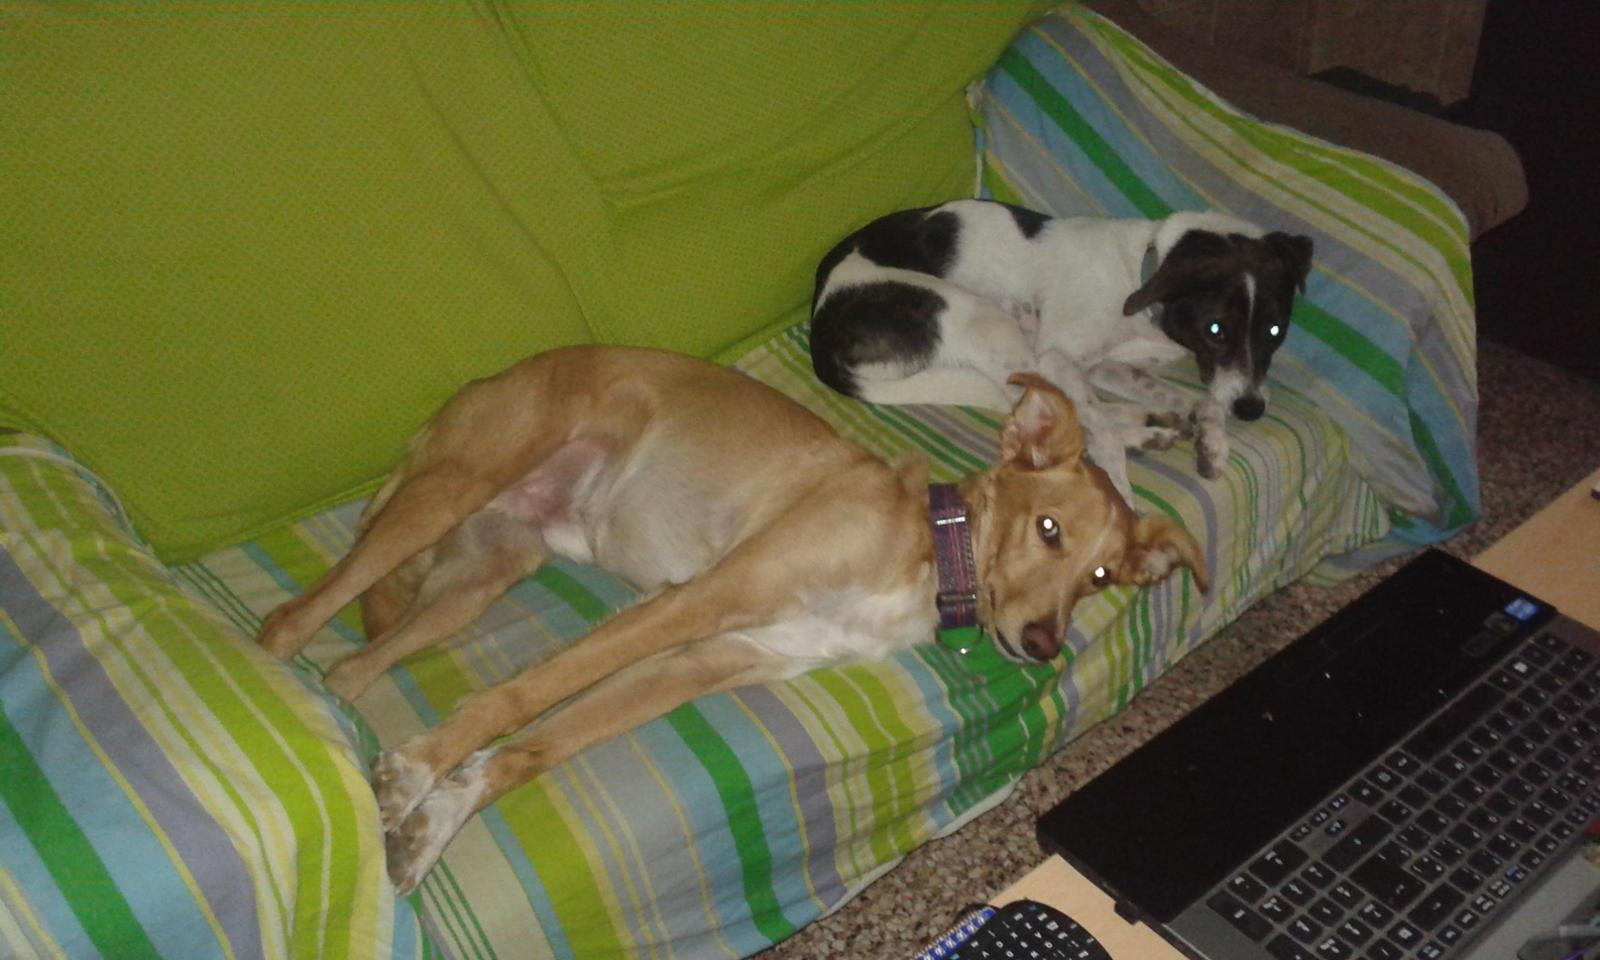 Rey y Doggy buscan madrinas y padrinos